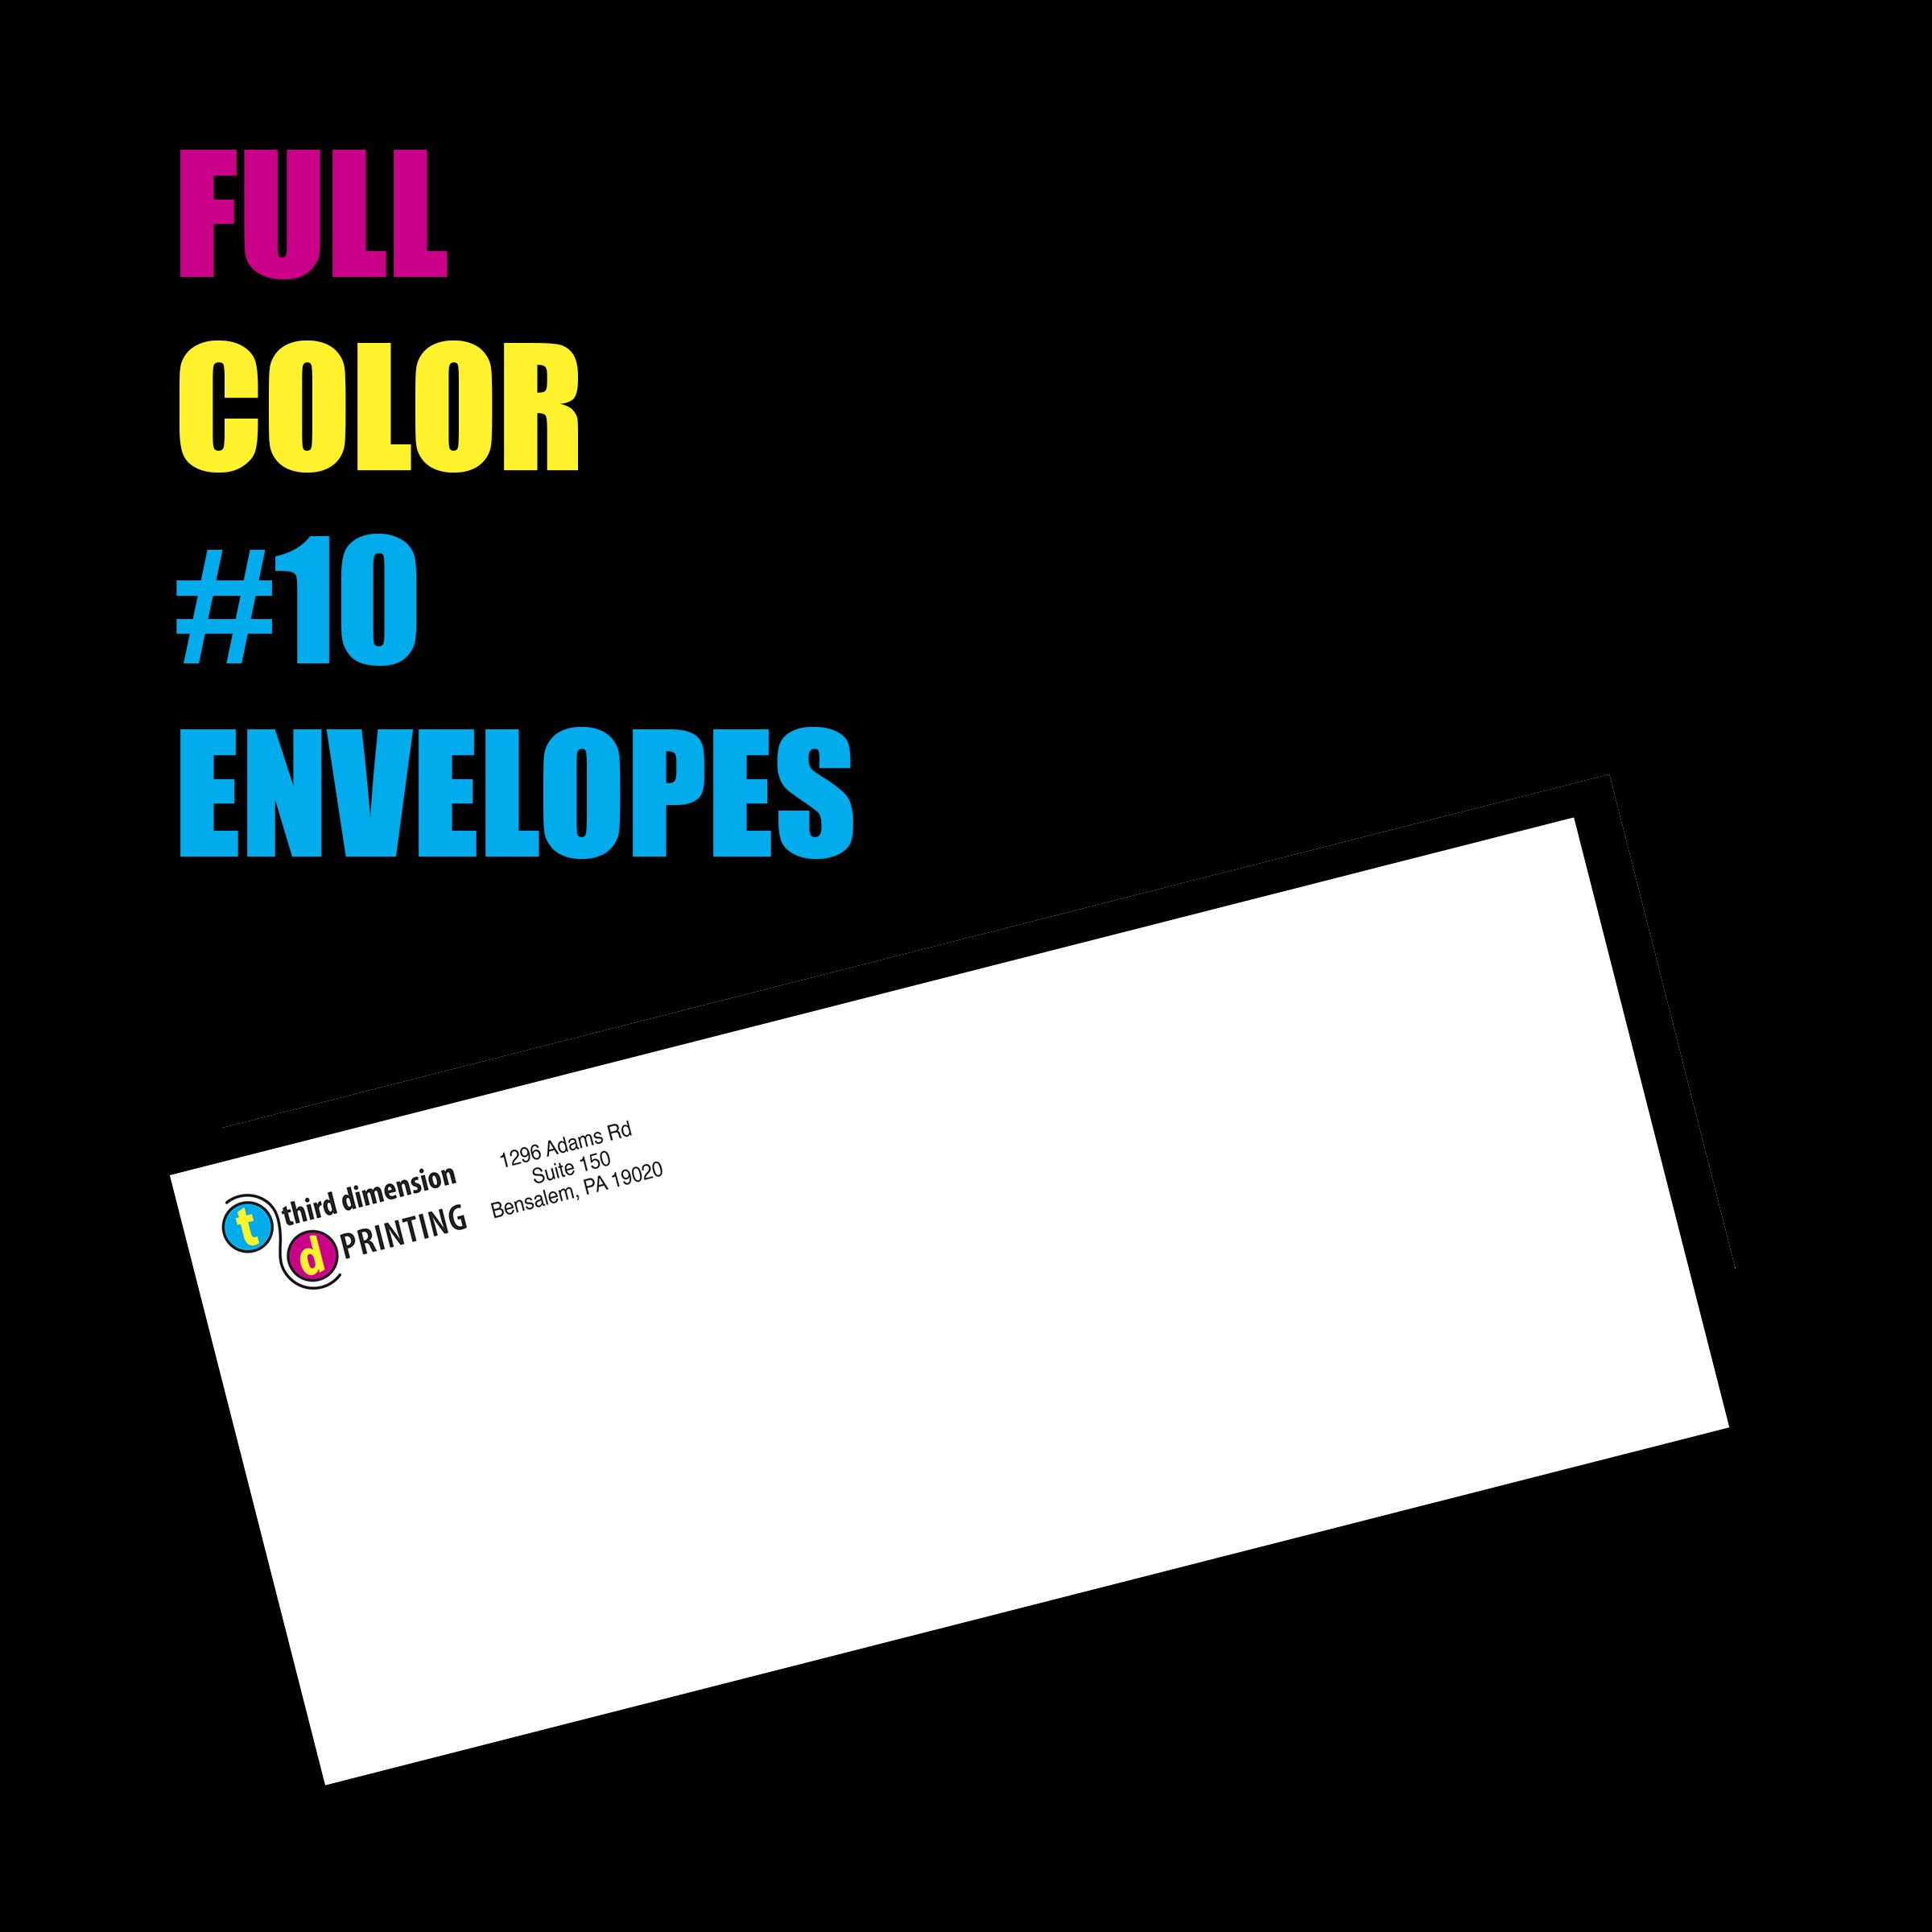 Full Color #10 Business Envelopes